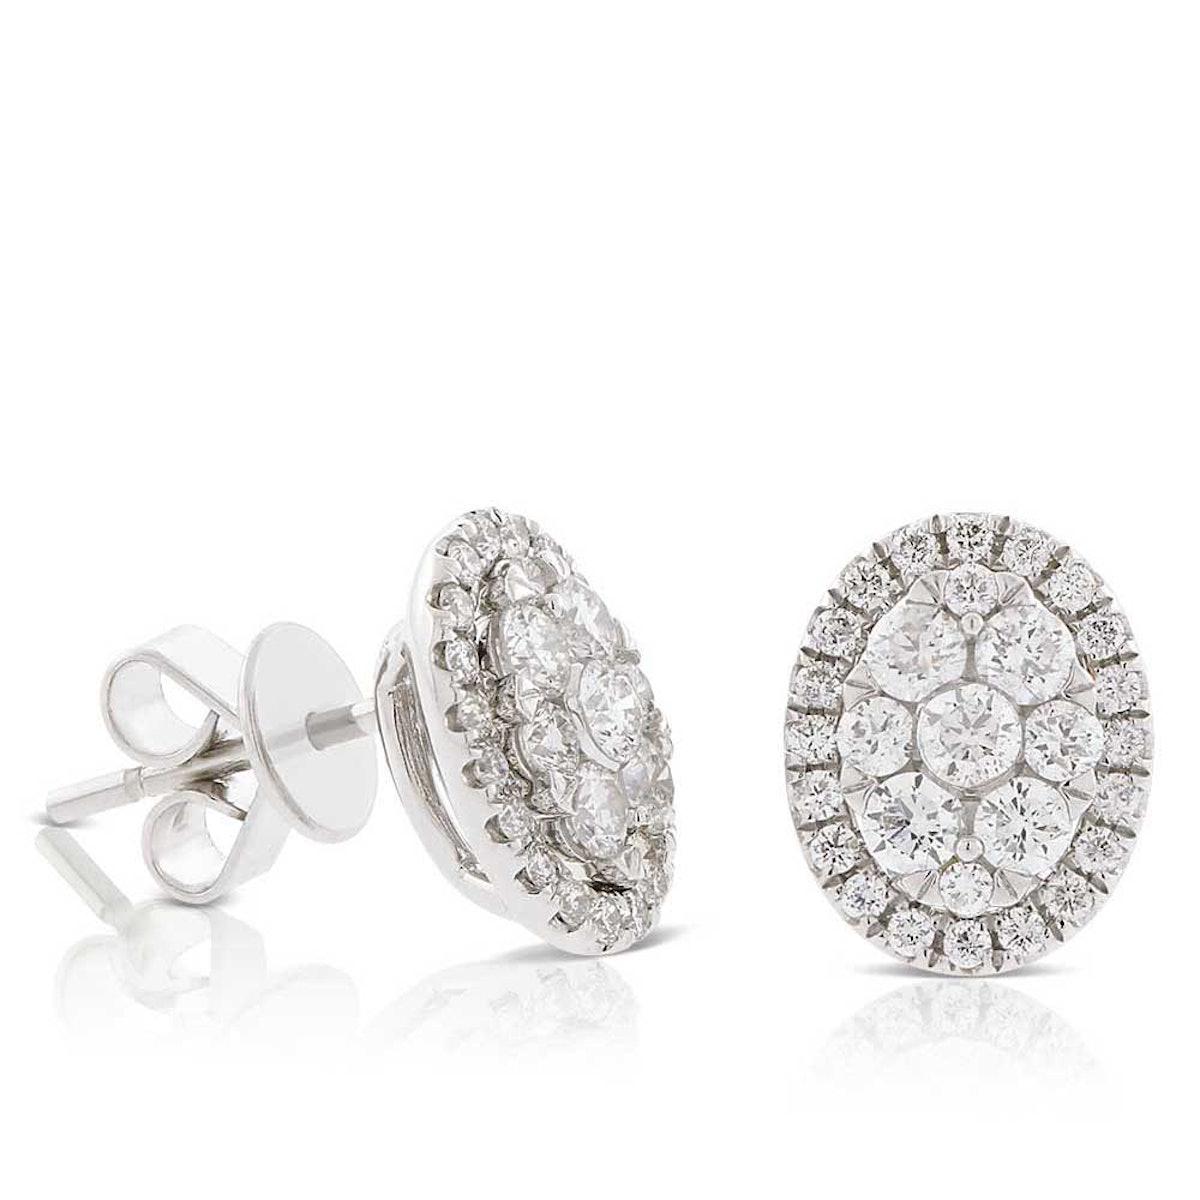 Diamond Cluster Oval Stud Earrings in 14K White Gold